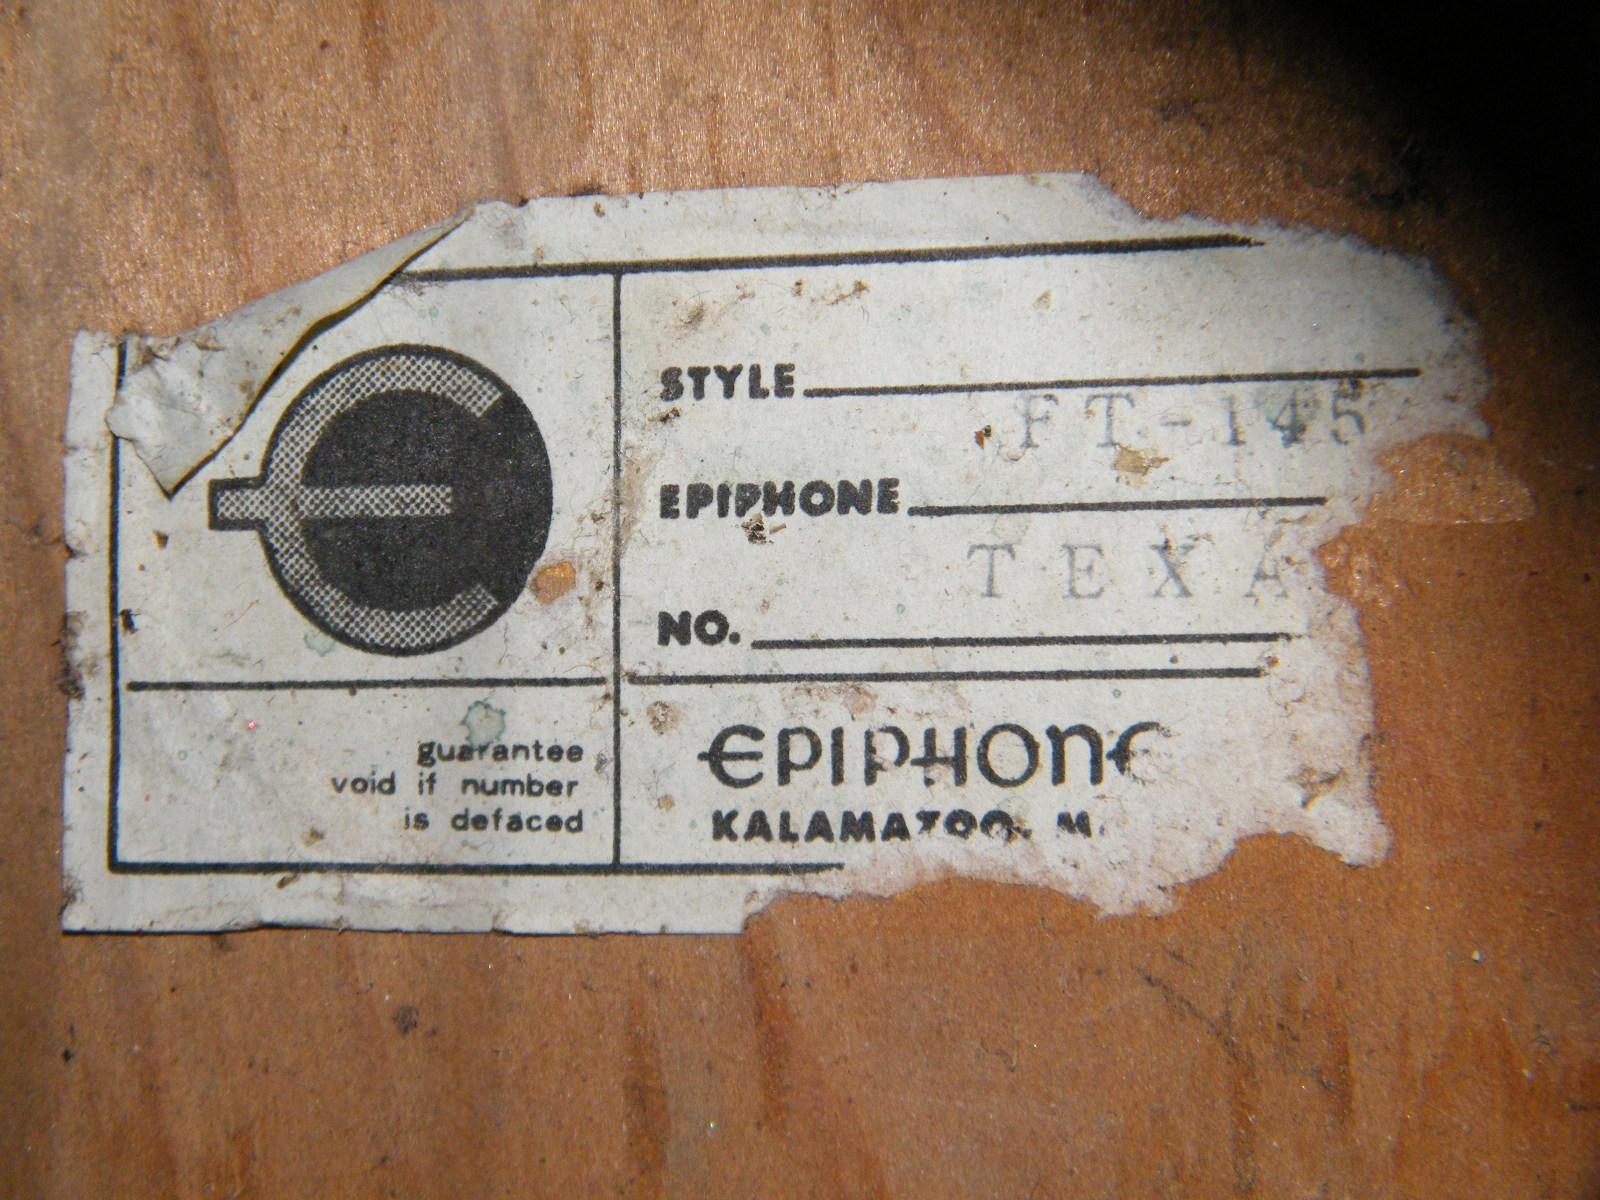 epiphone-ft-145-texan-77122.jpg